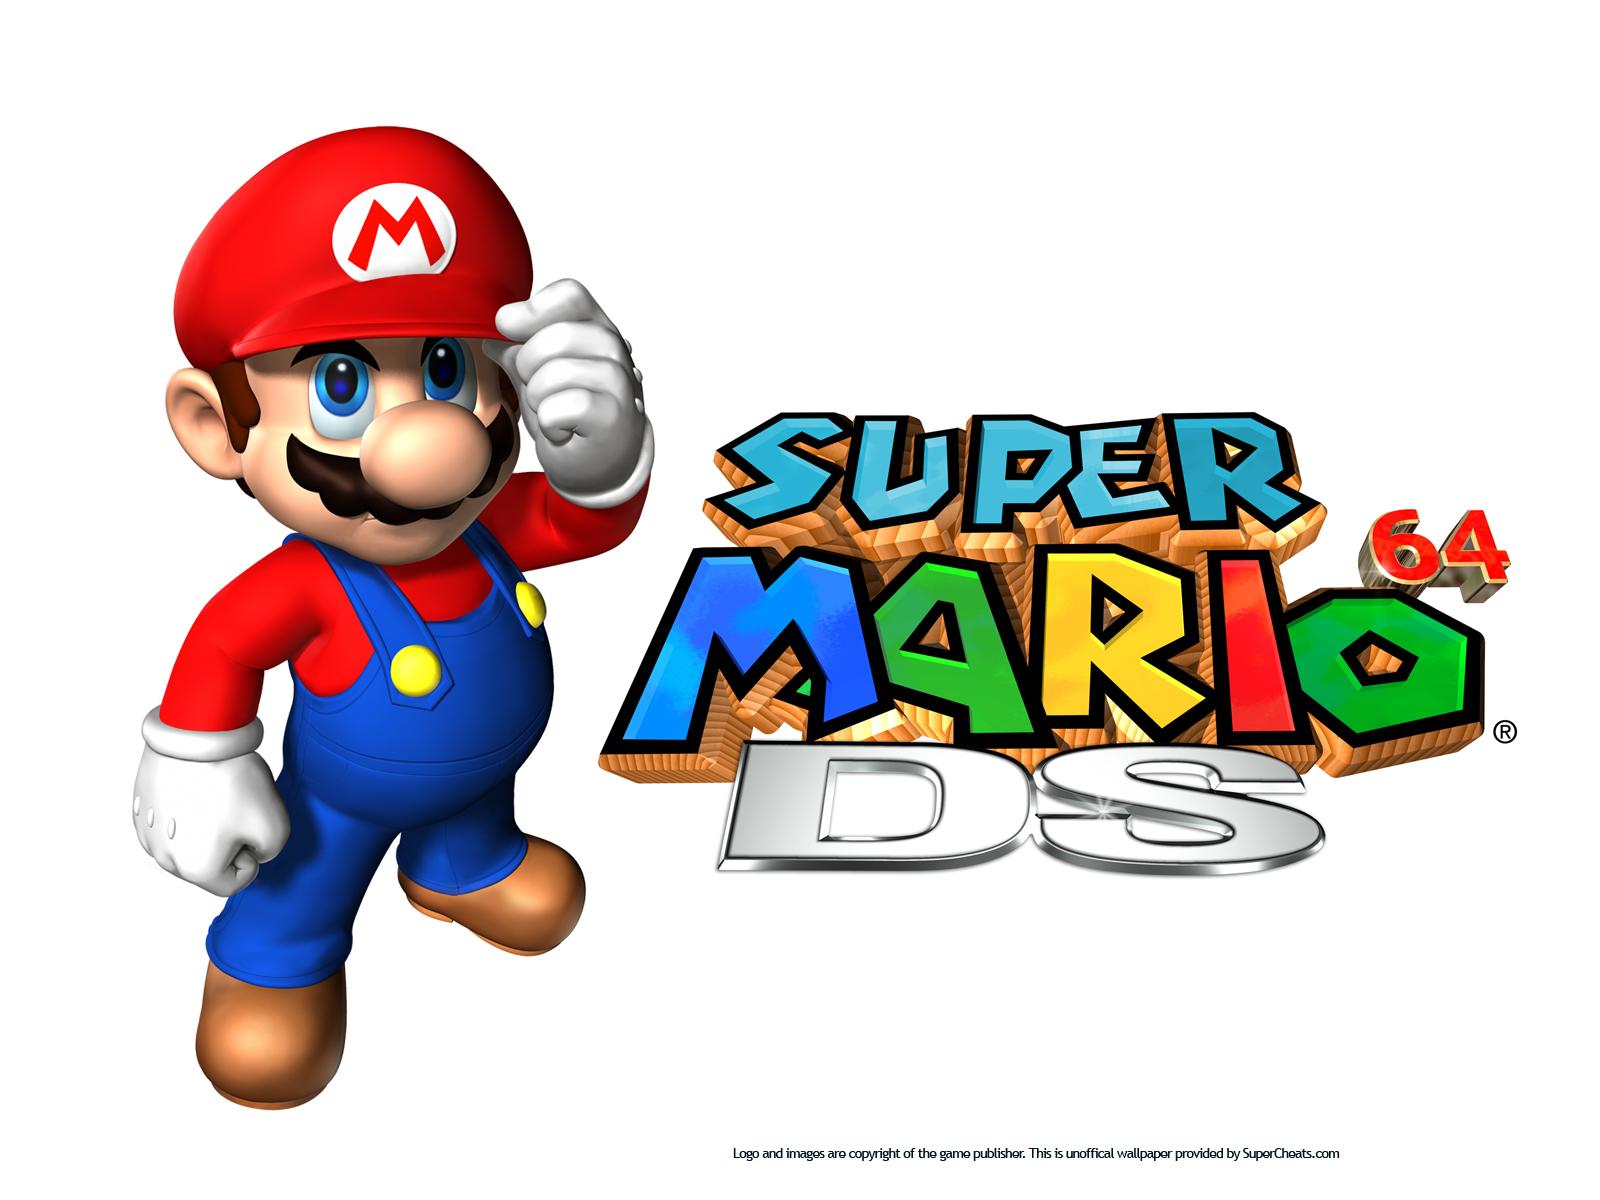 ⛔ Super mario 64 ds download apk | Download Super mario 64